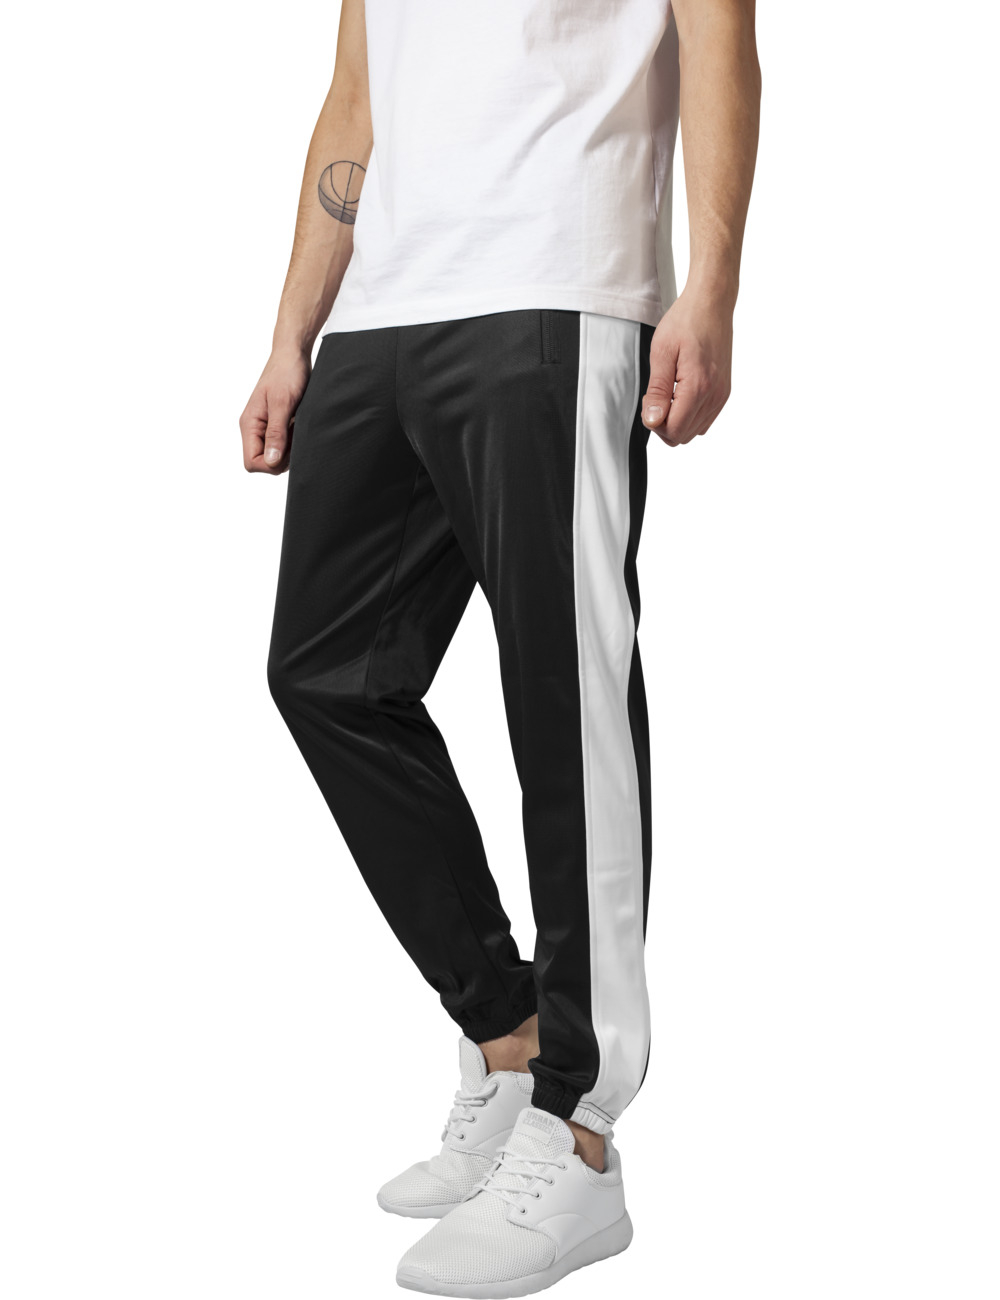 Urban Classics Herren Sweatpants Track XXL, blk/wht (050)